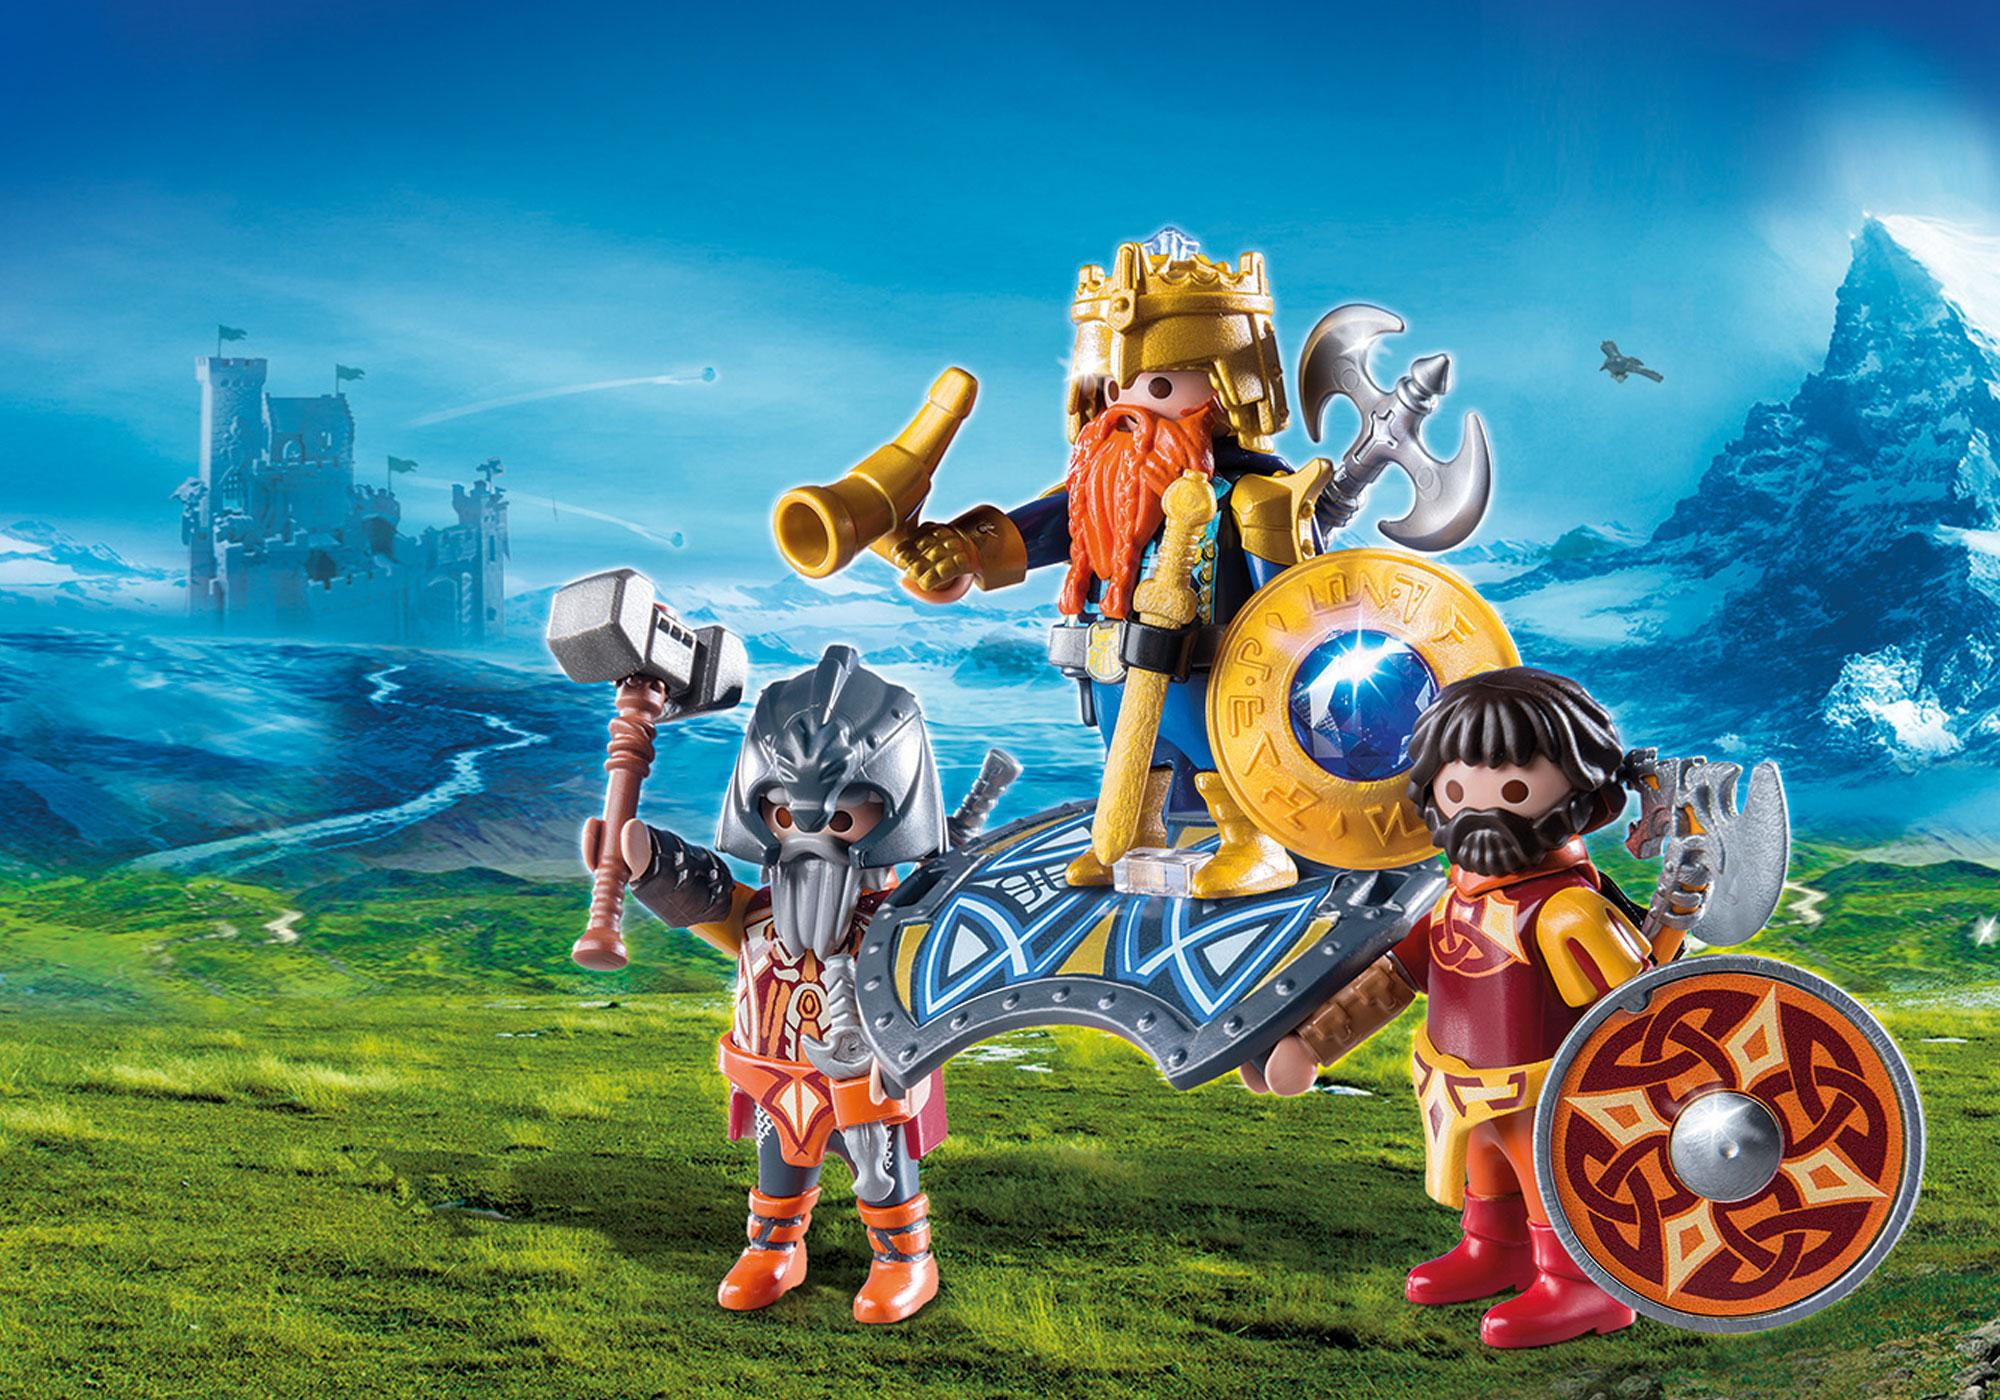 9344_product_detail/Βασιλιάς των Νάνων με δύο φρουρούς